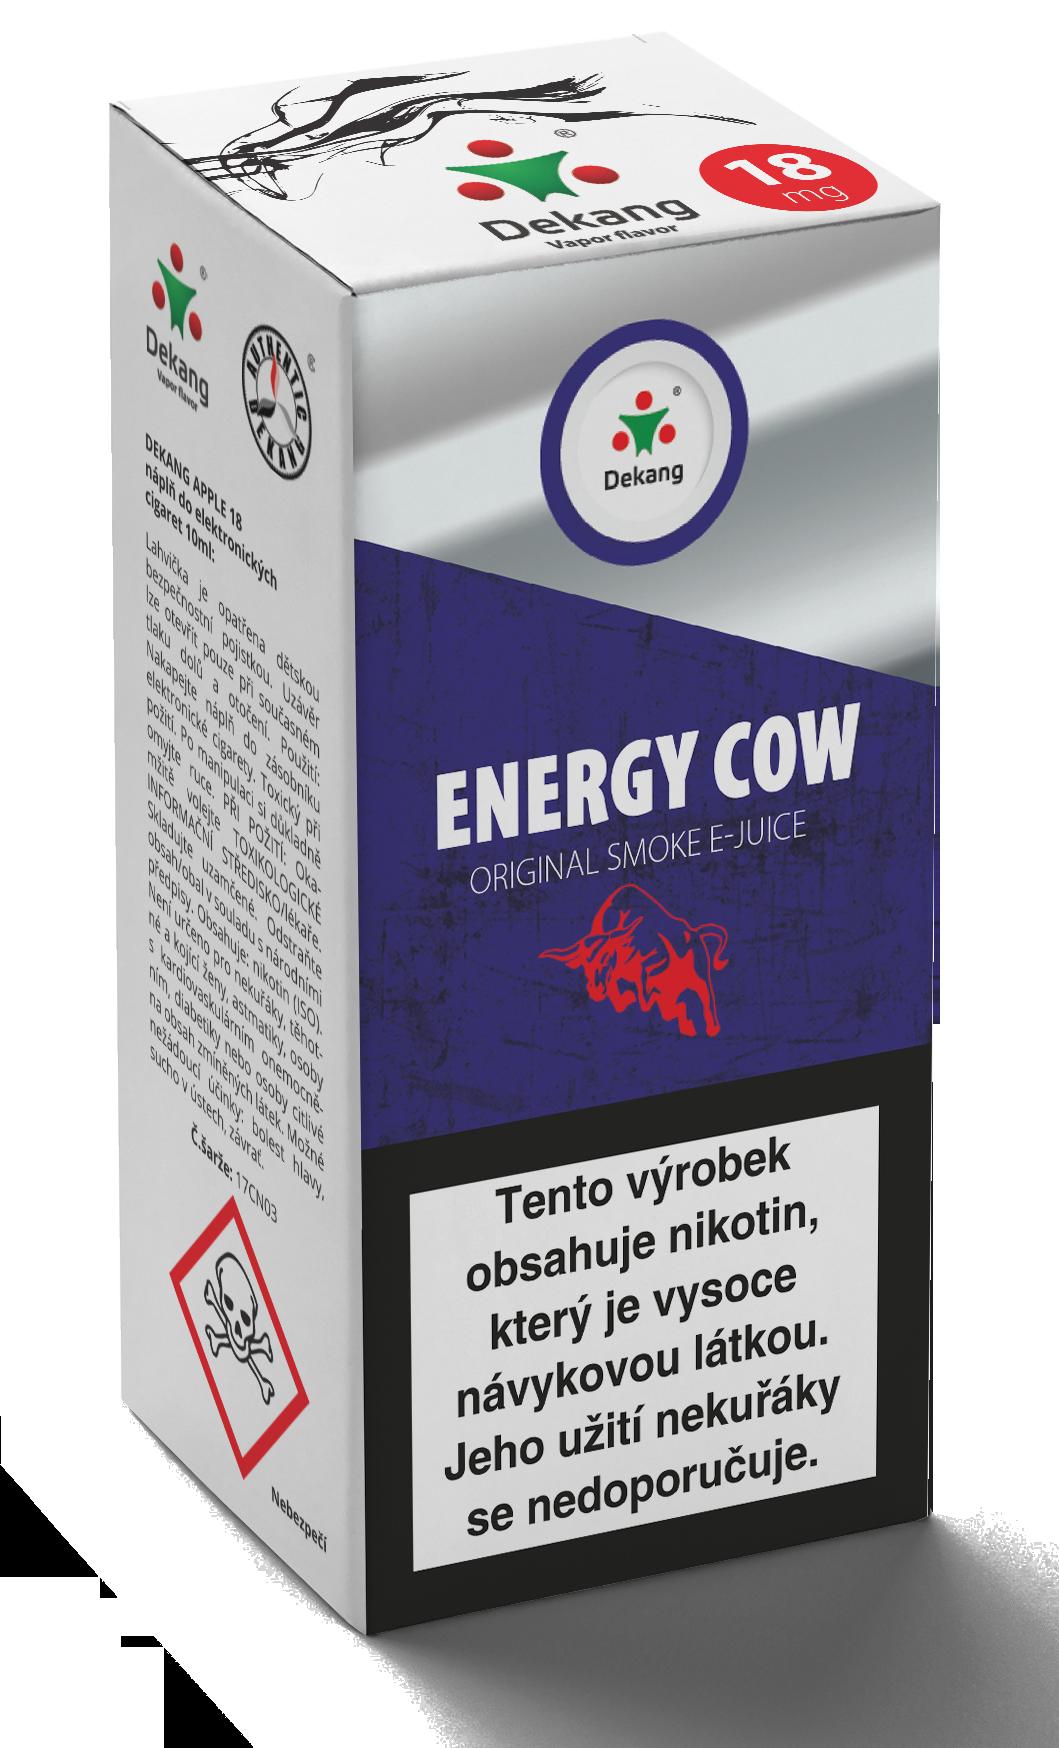 E-liquid Dekang 10ml Energy Cow Množství nikotinu: 0mg